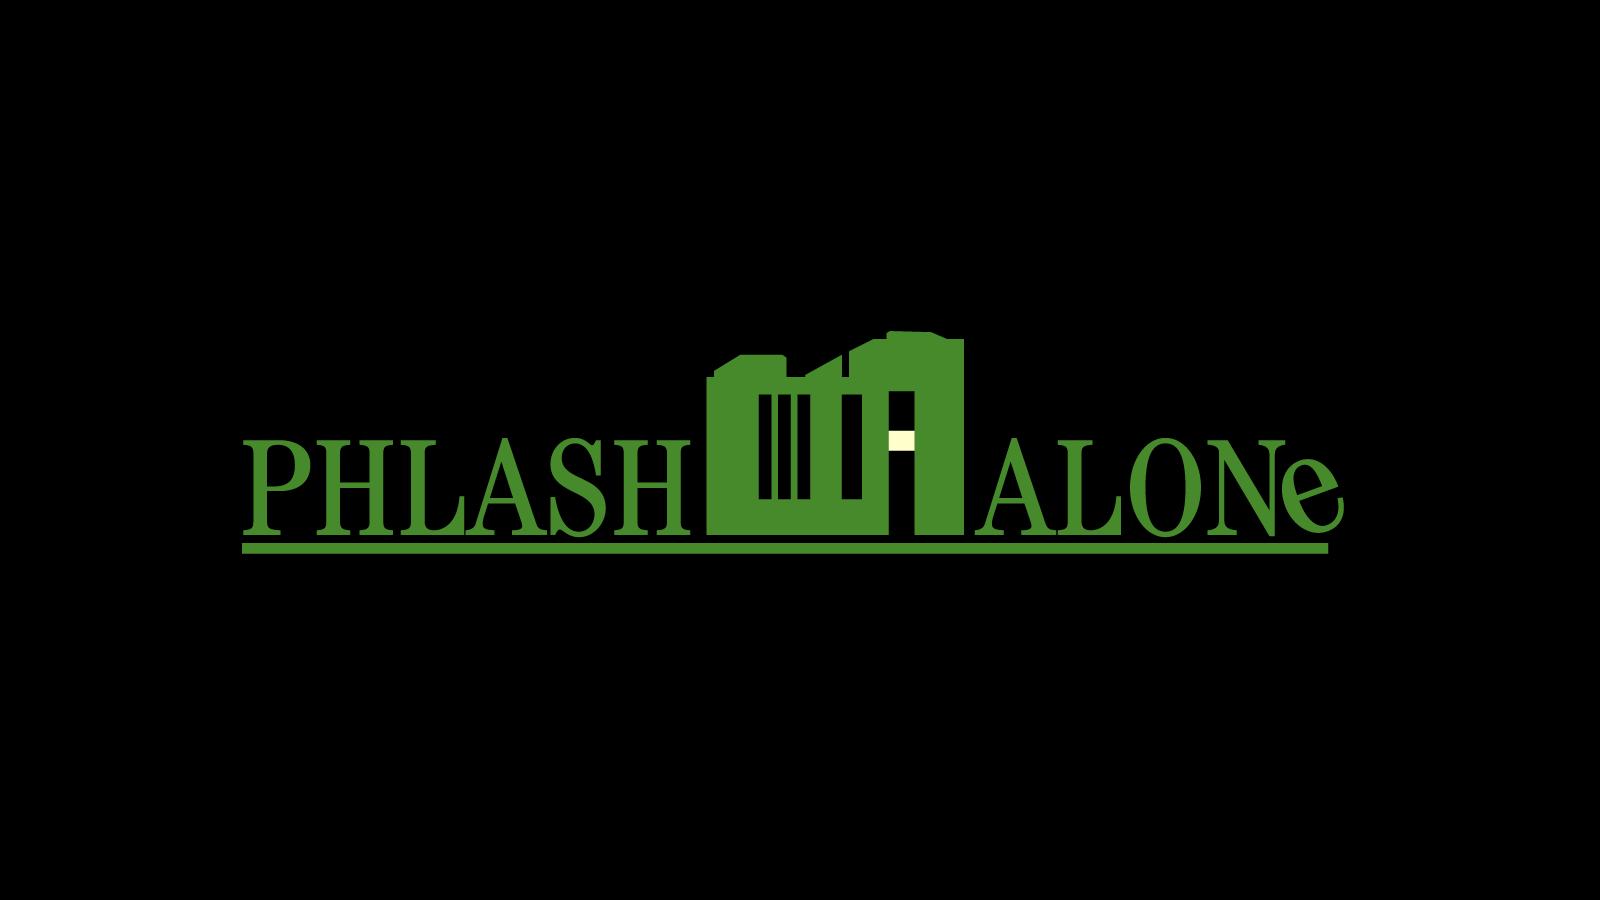 Phlash Alone